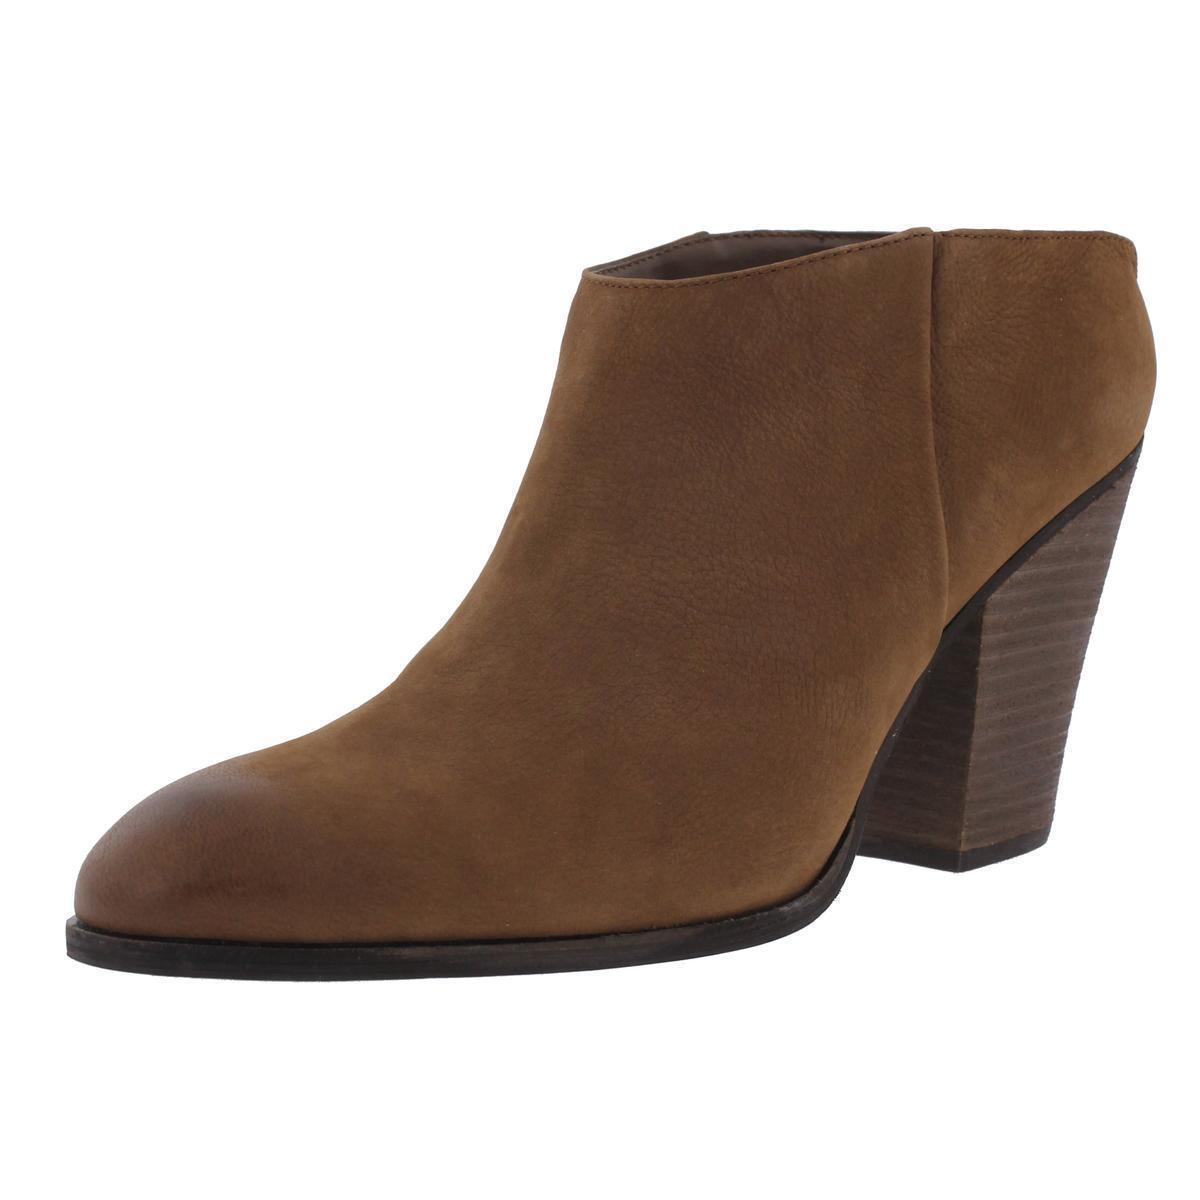 Steve Madden 2894 Womens Hilltop Brown Nubuck Booties Shoes Size 6